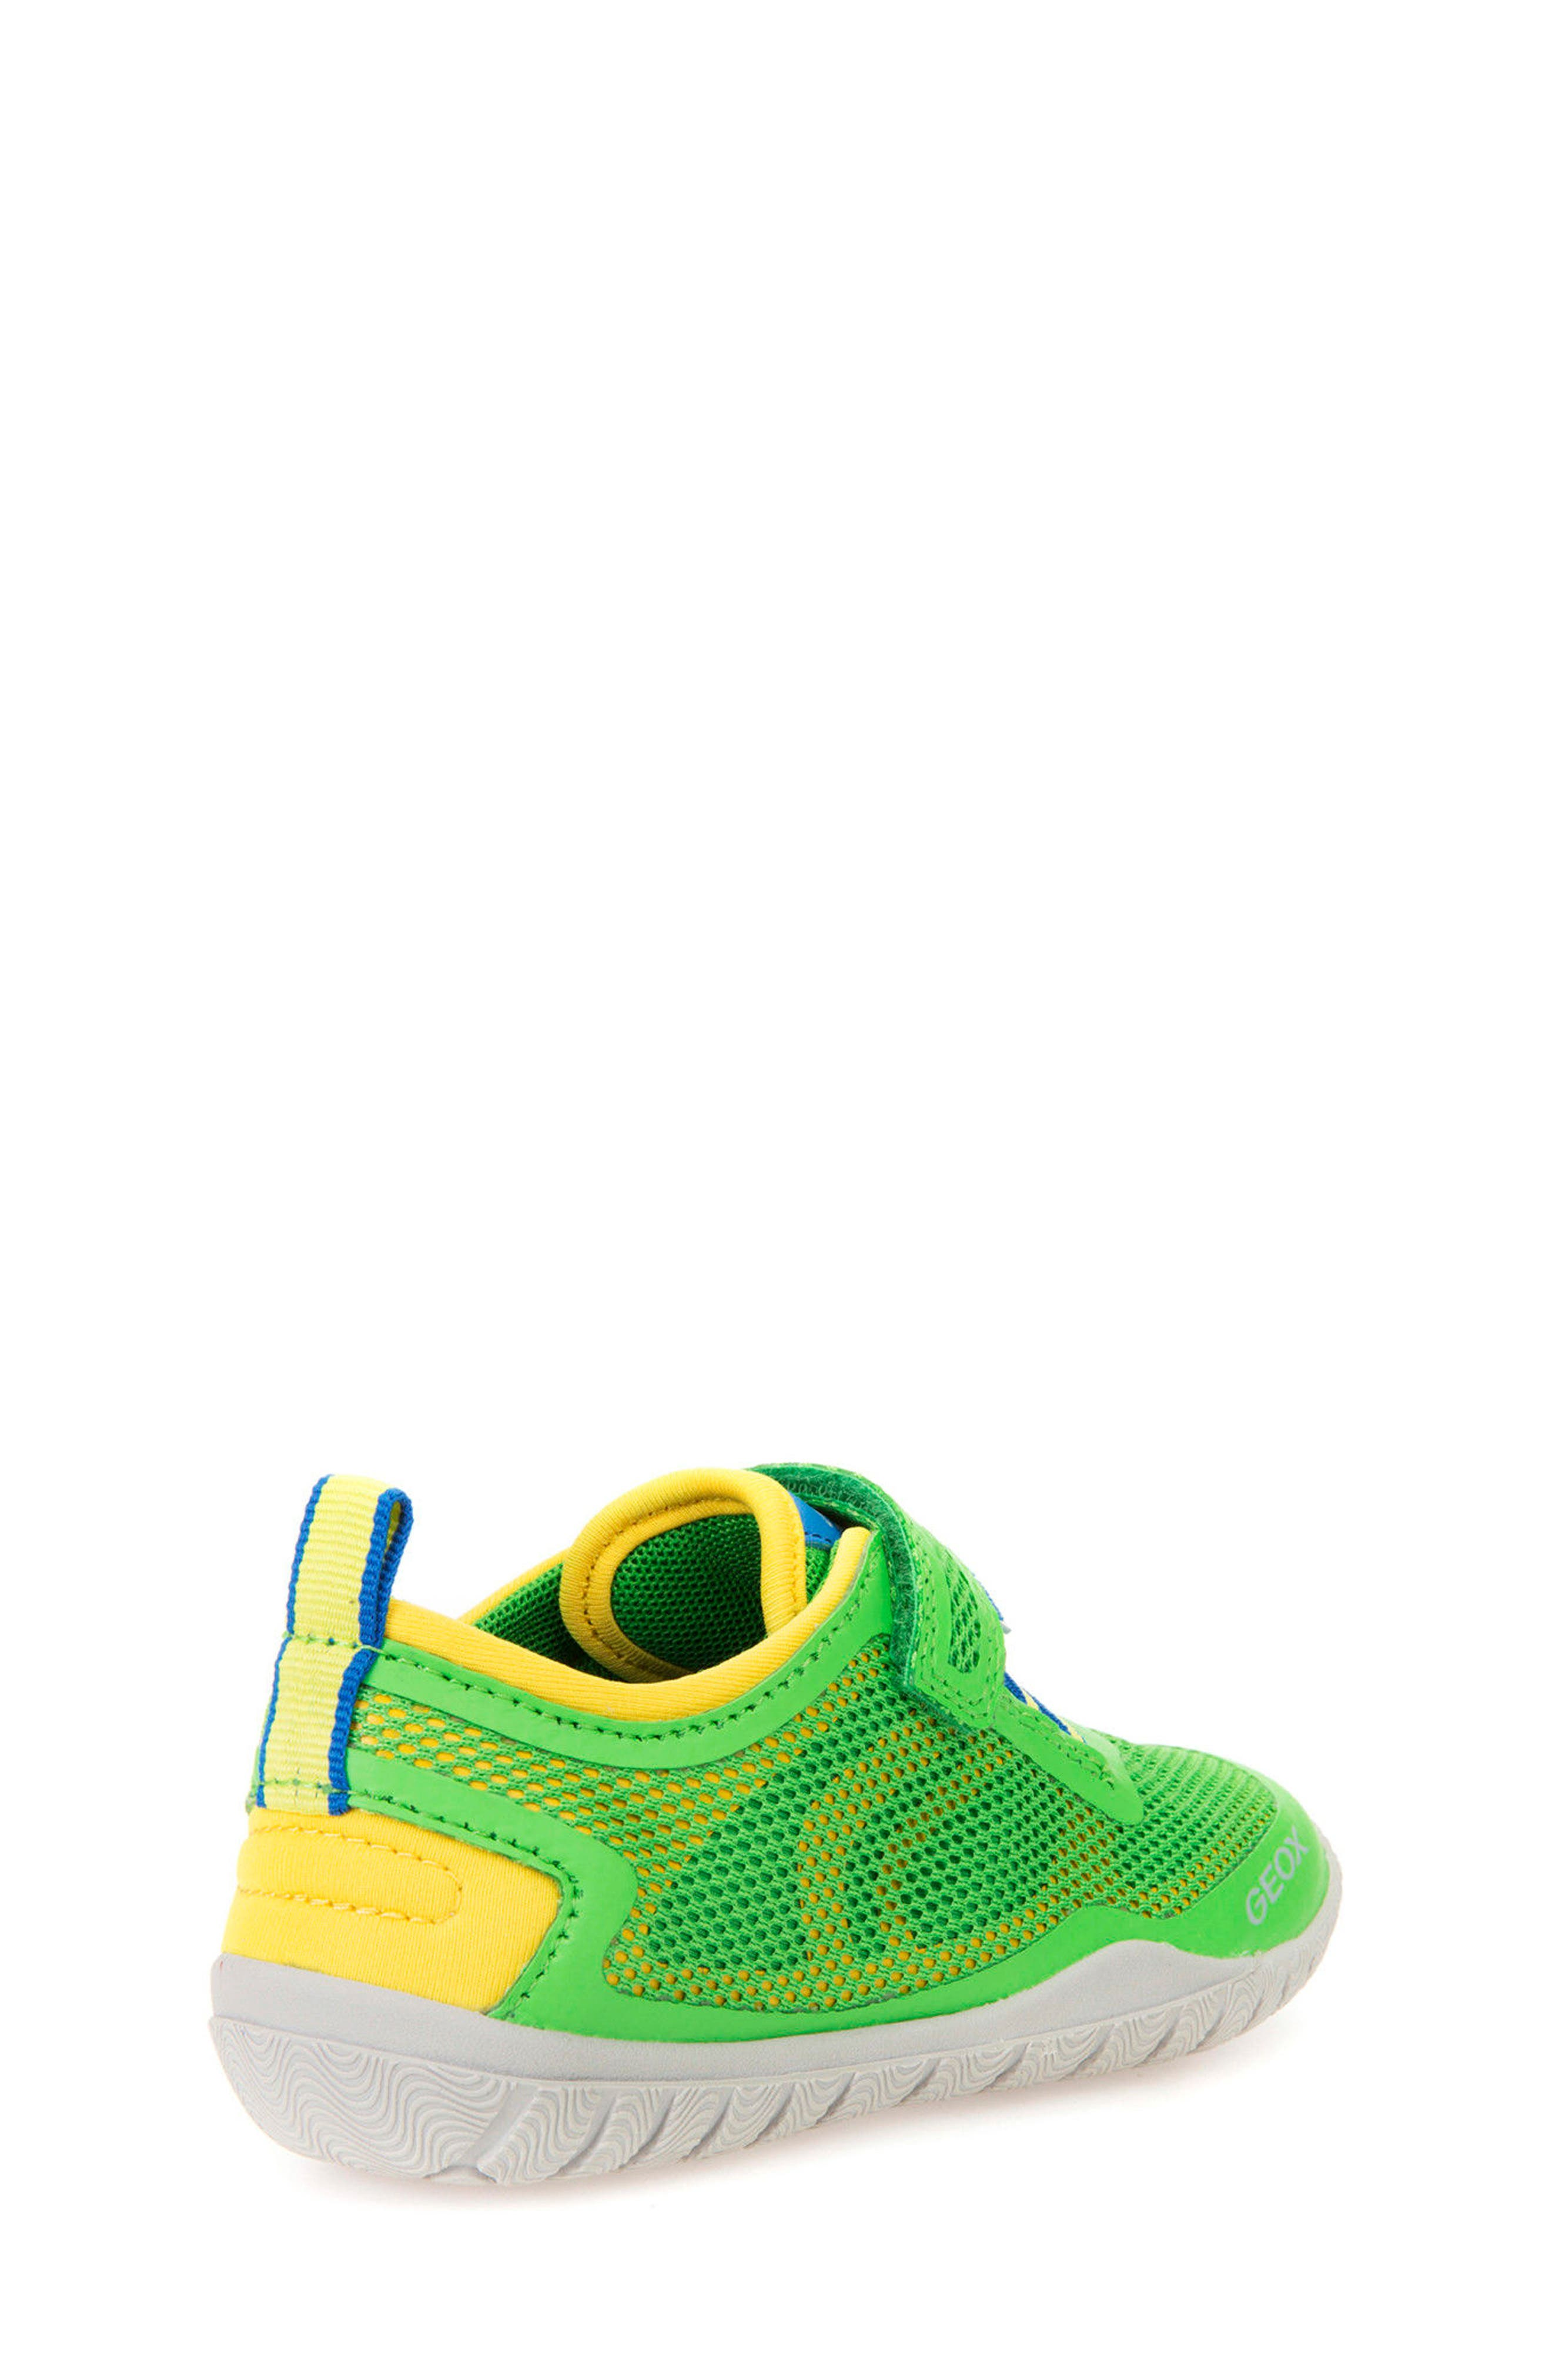 Trifon Sneaker,                             Alternate thumbnail 7, color,                             GREEN/ YELLOW